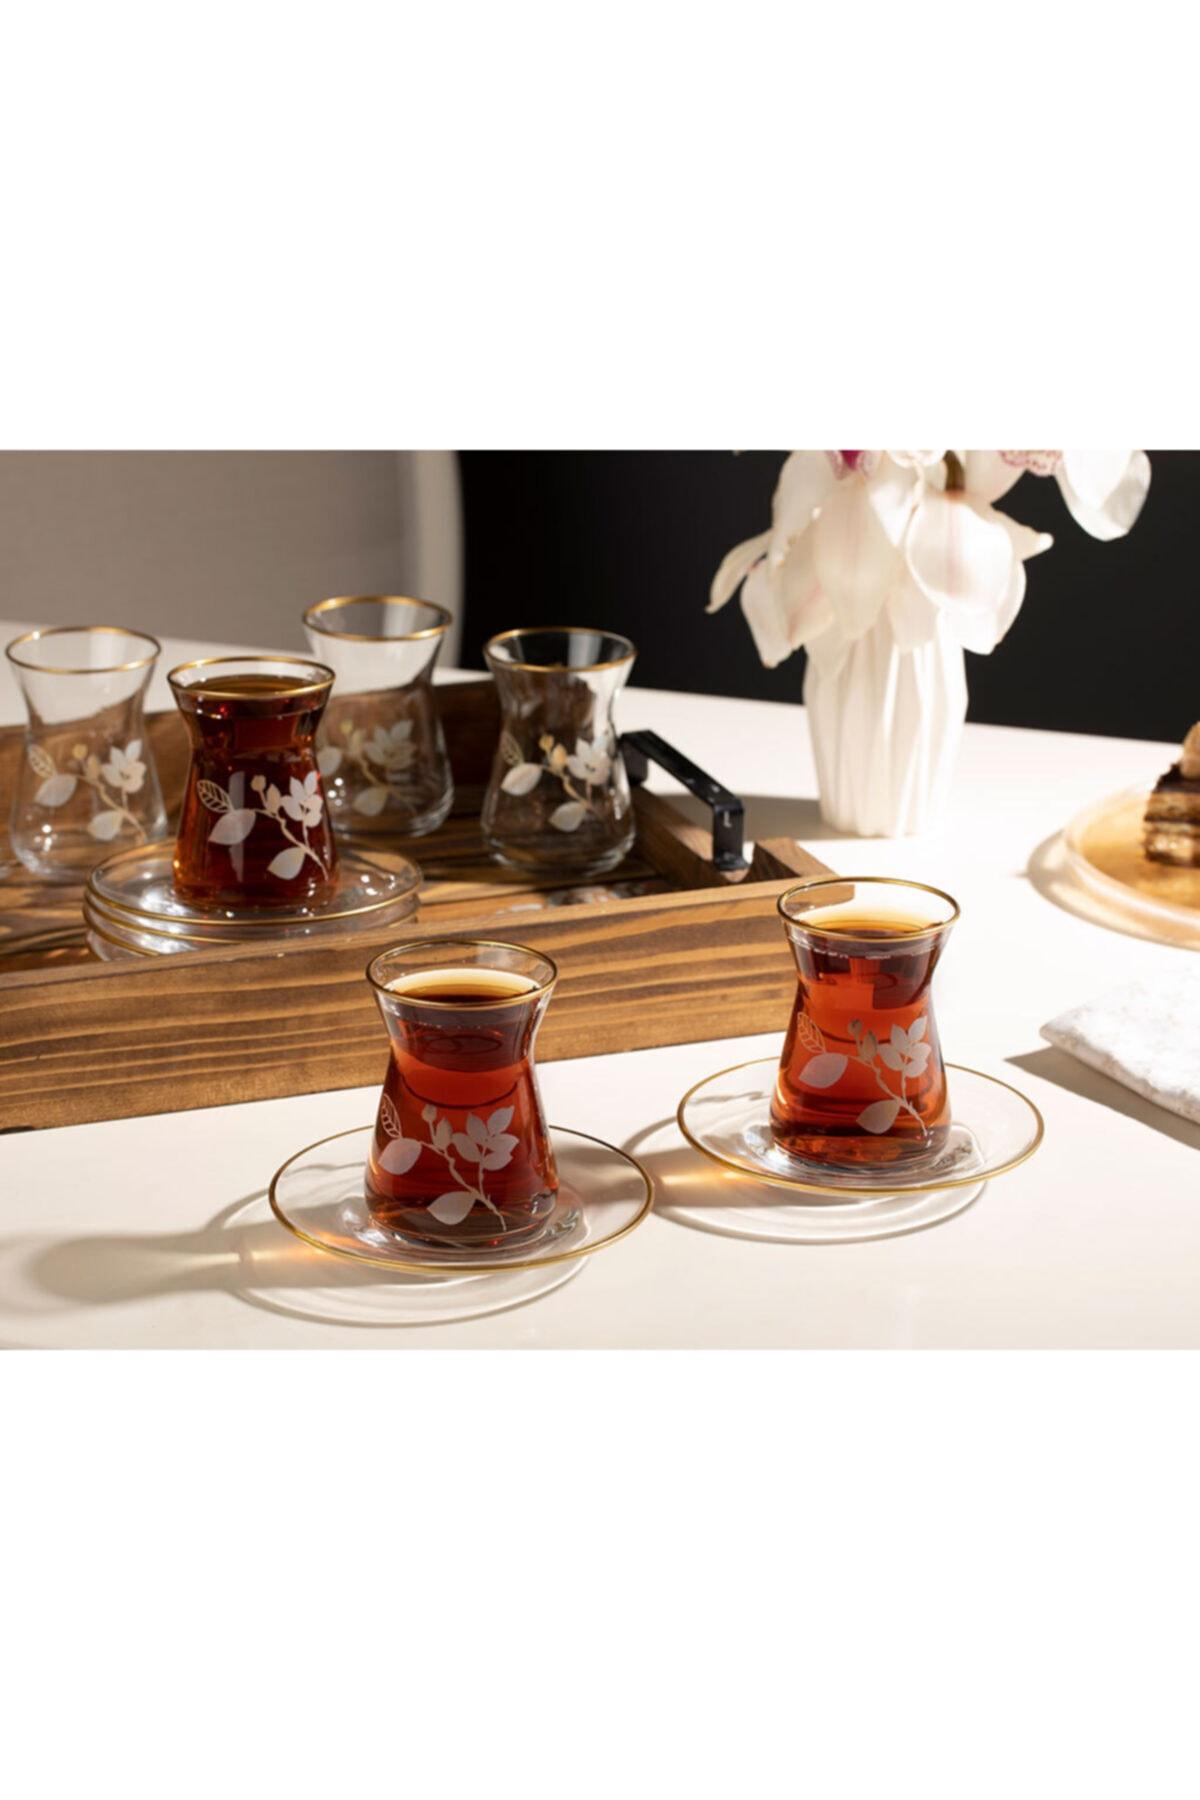 English Home Şeffaf Bahar Dalı Cam 12 Parça Çay Seti 130 ml 1